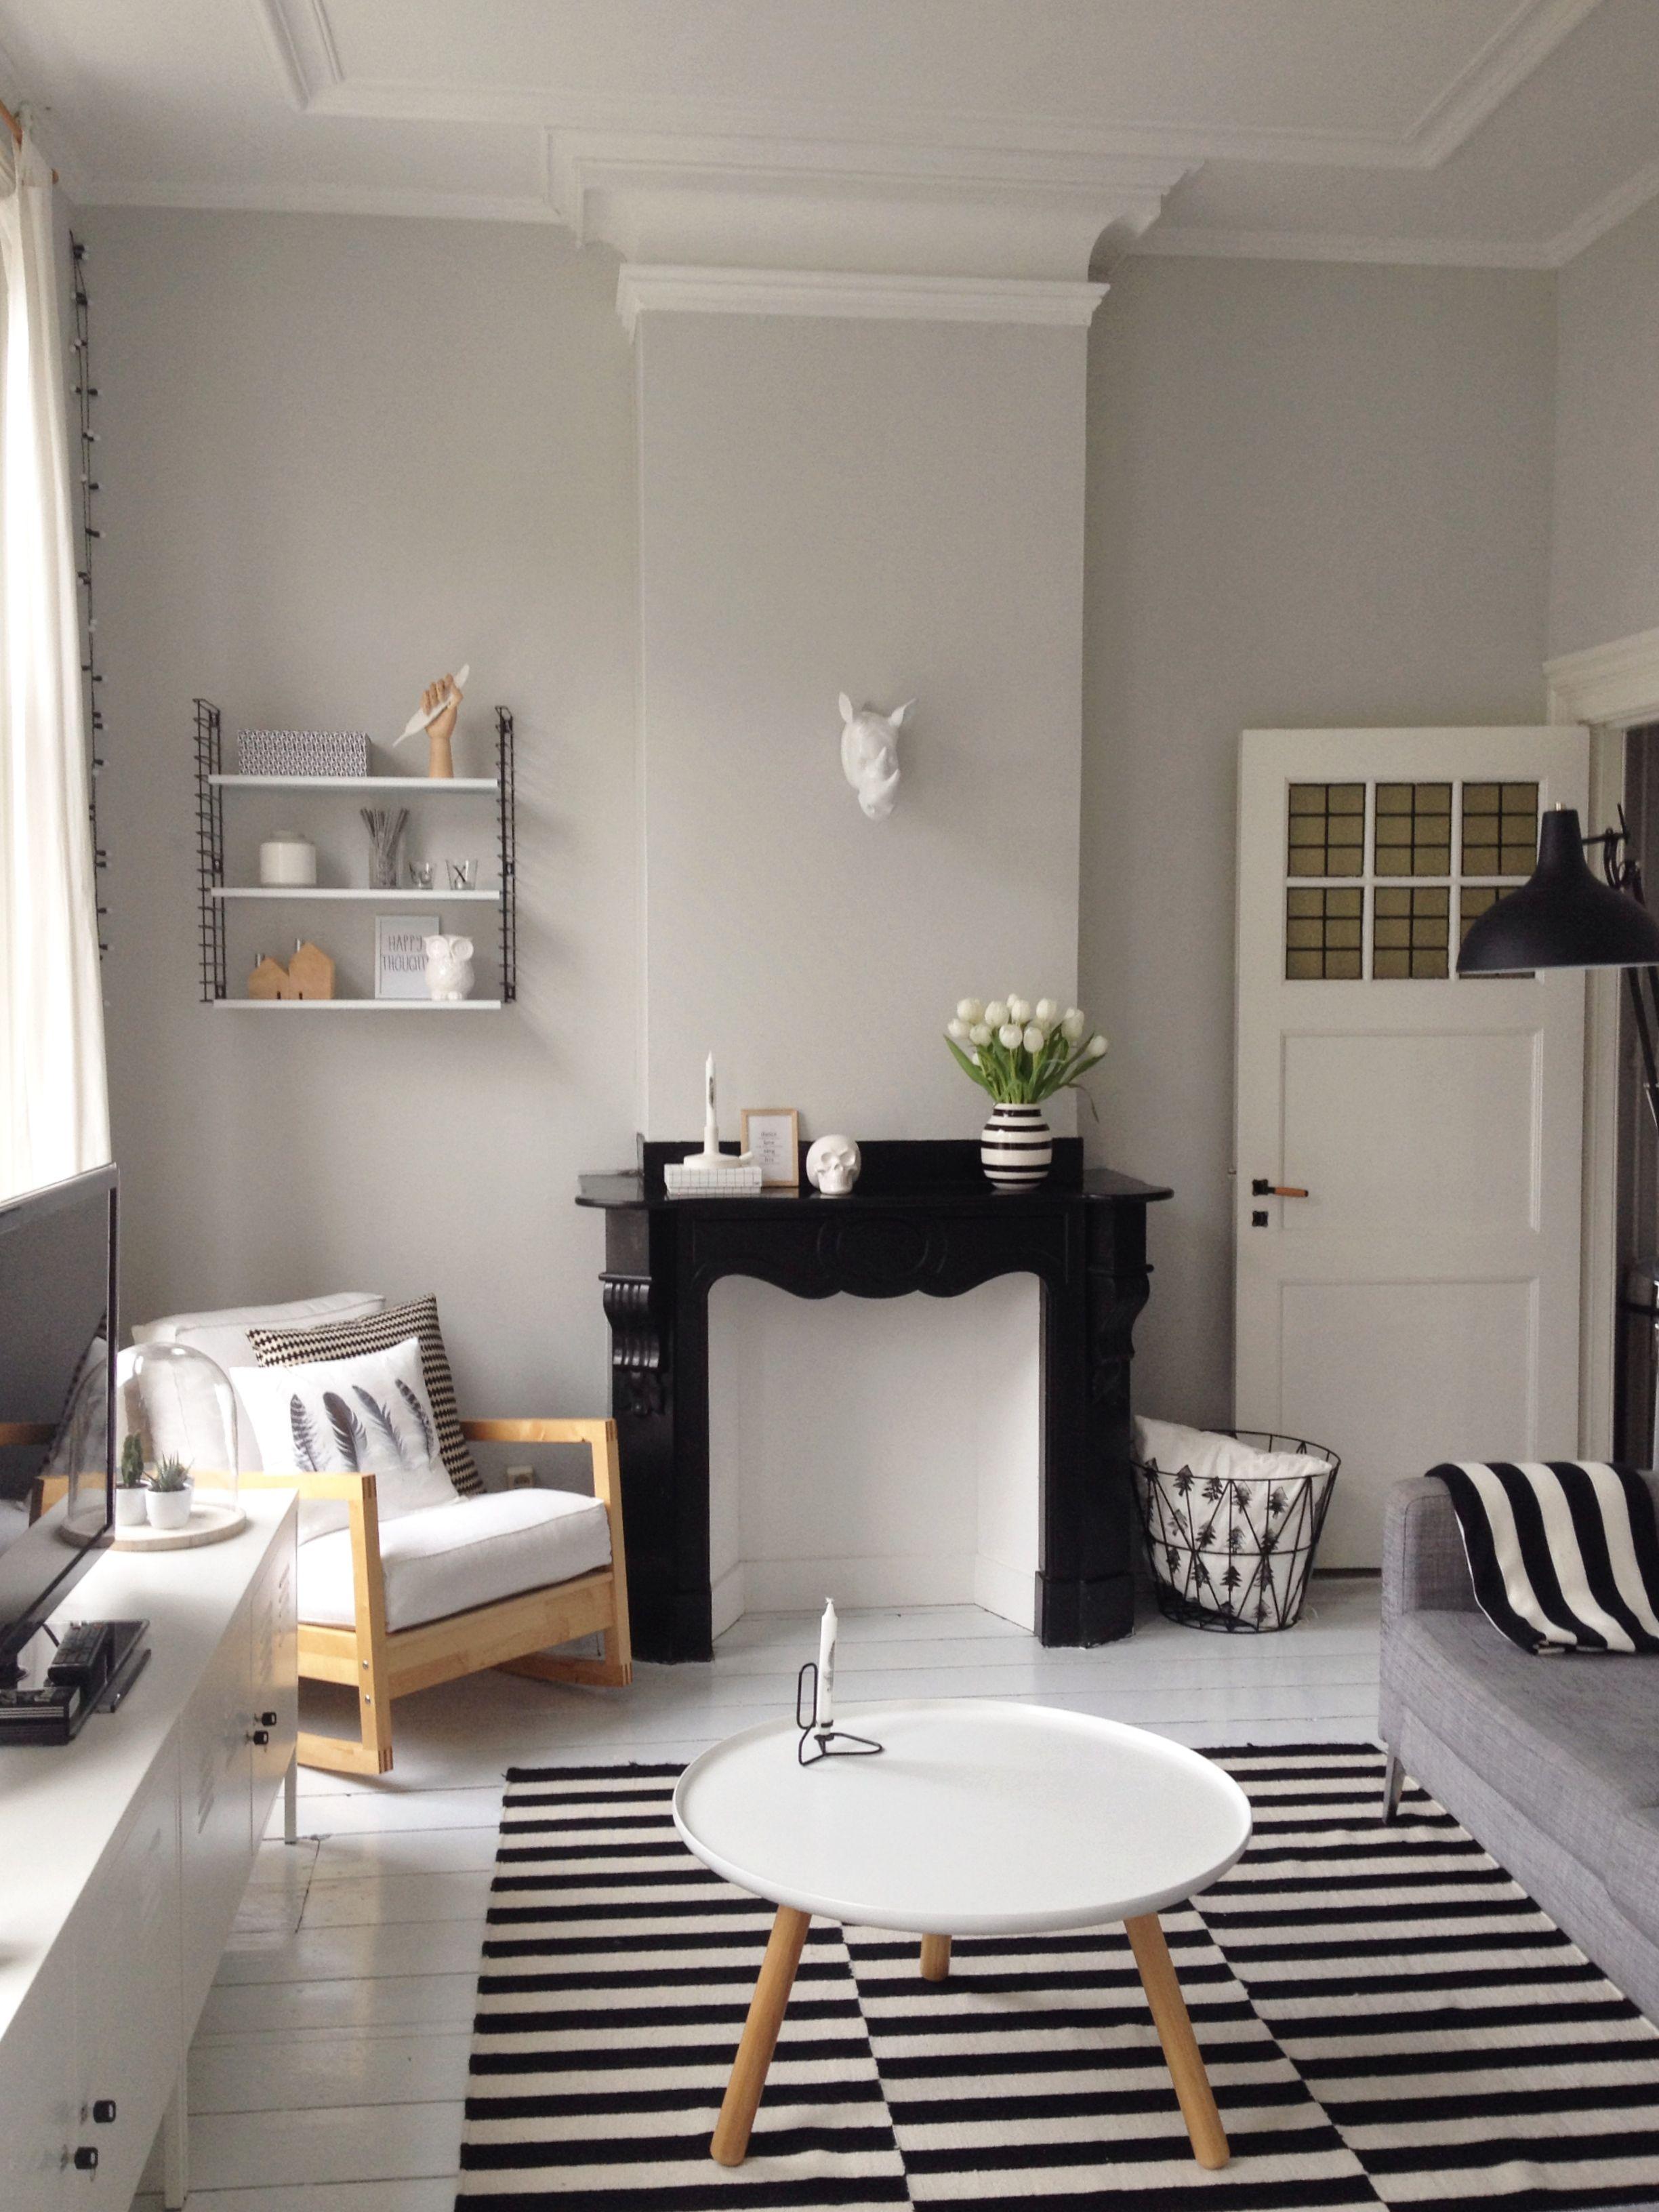 jaren 20 woning | inspiratie woonkamer in 2018 | Pinterest ...